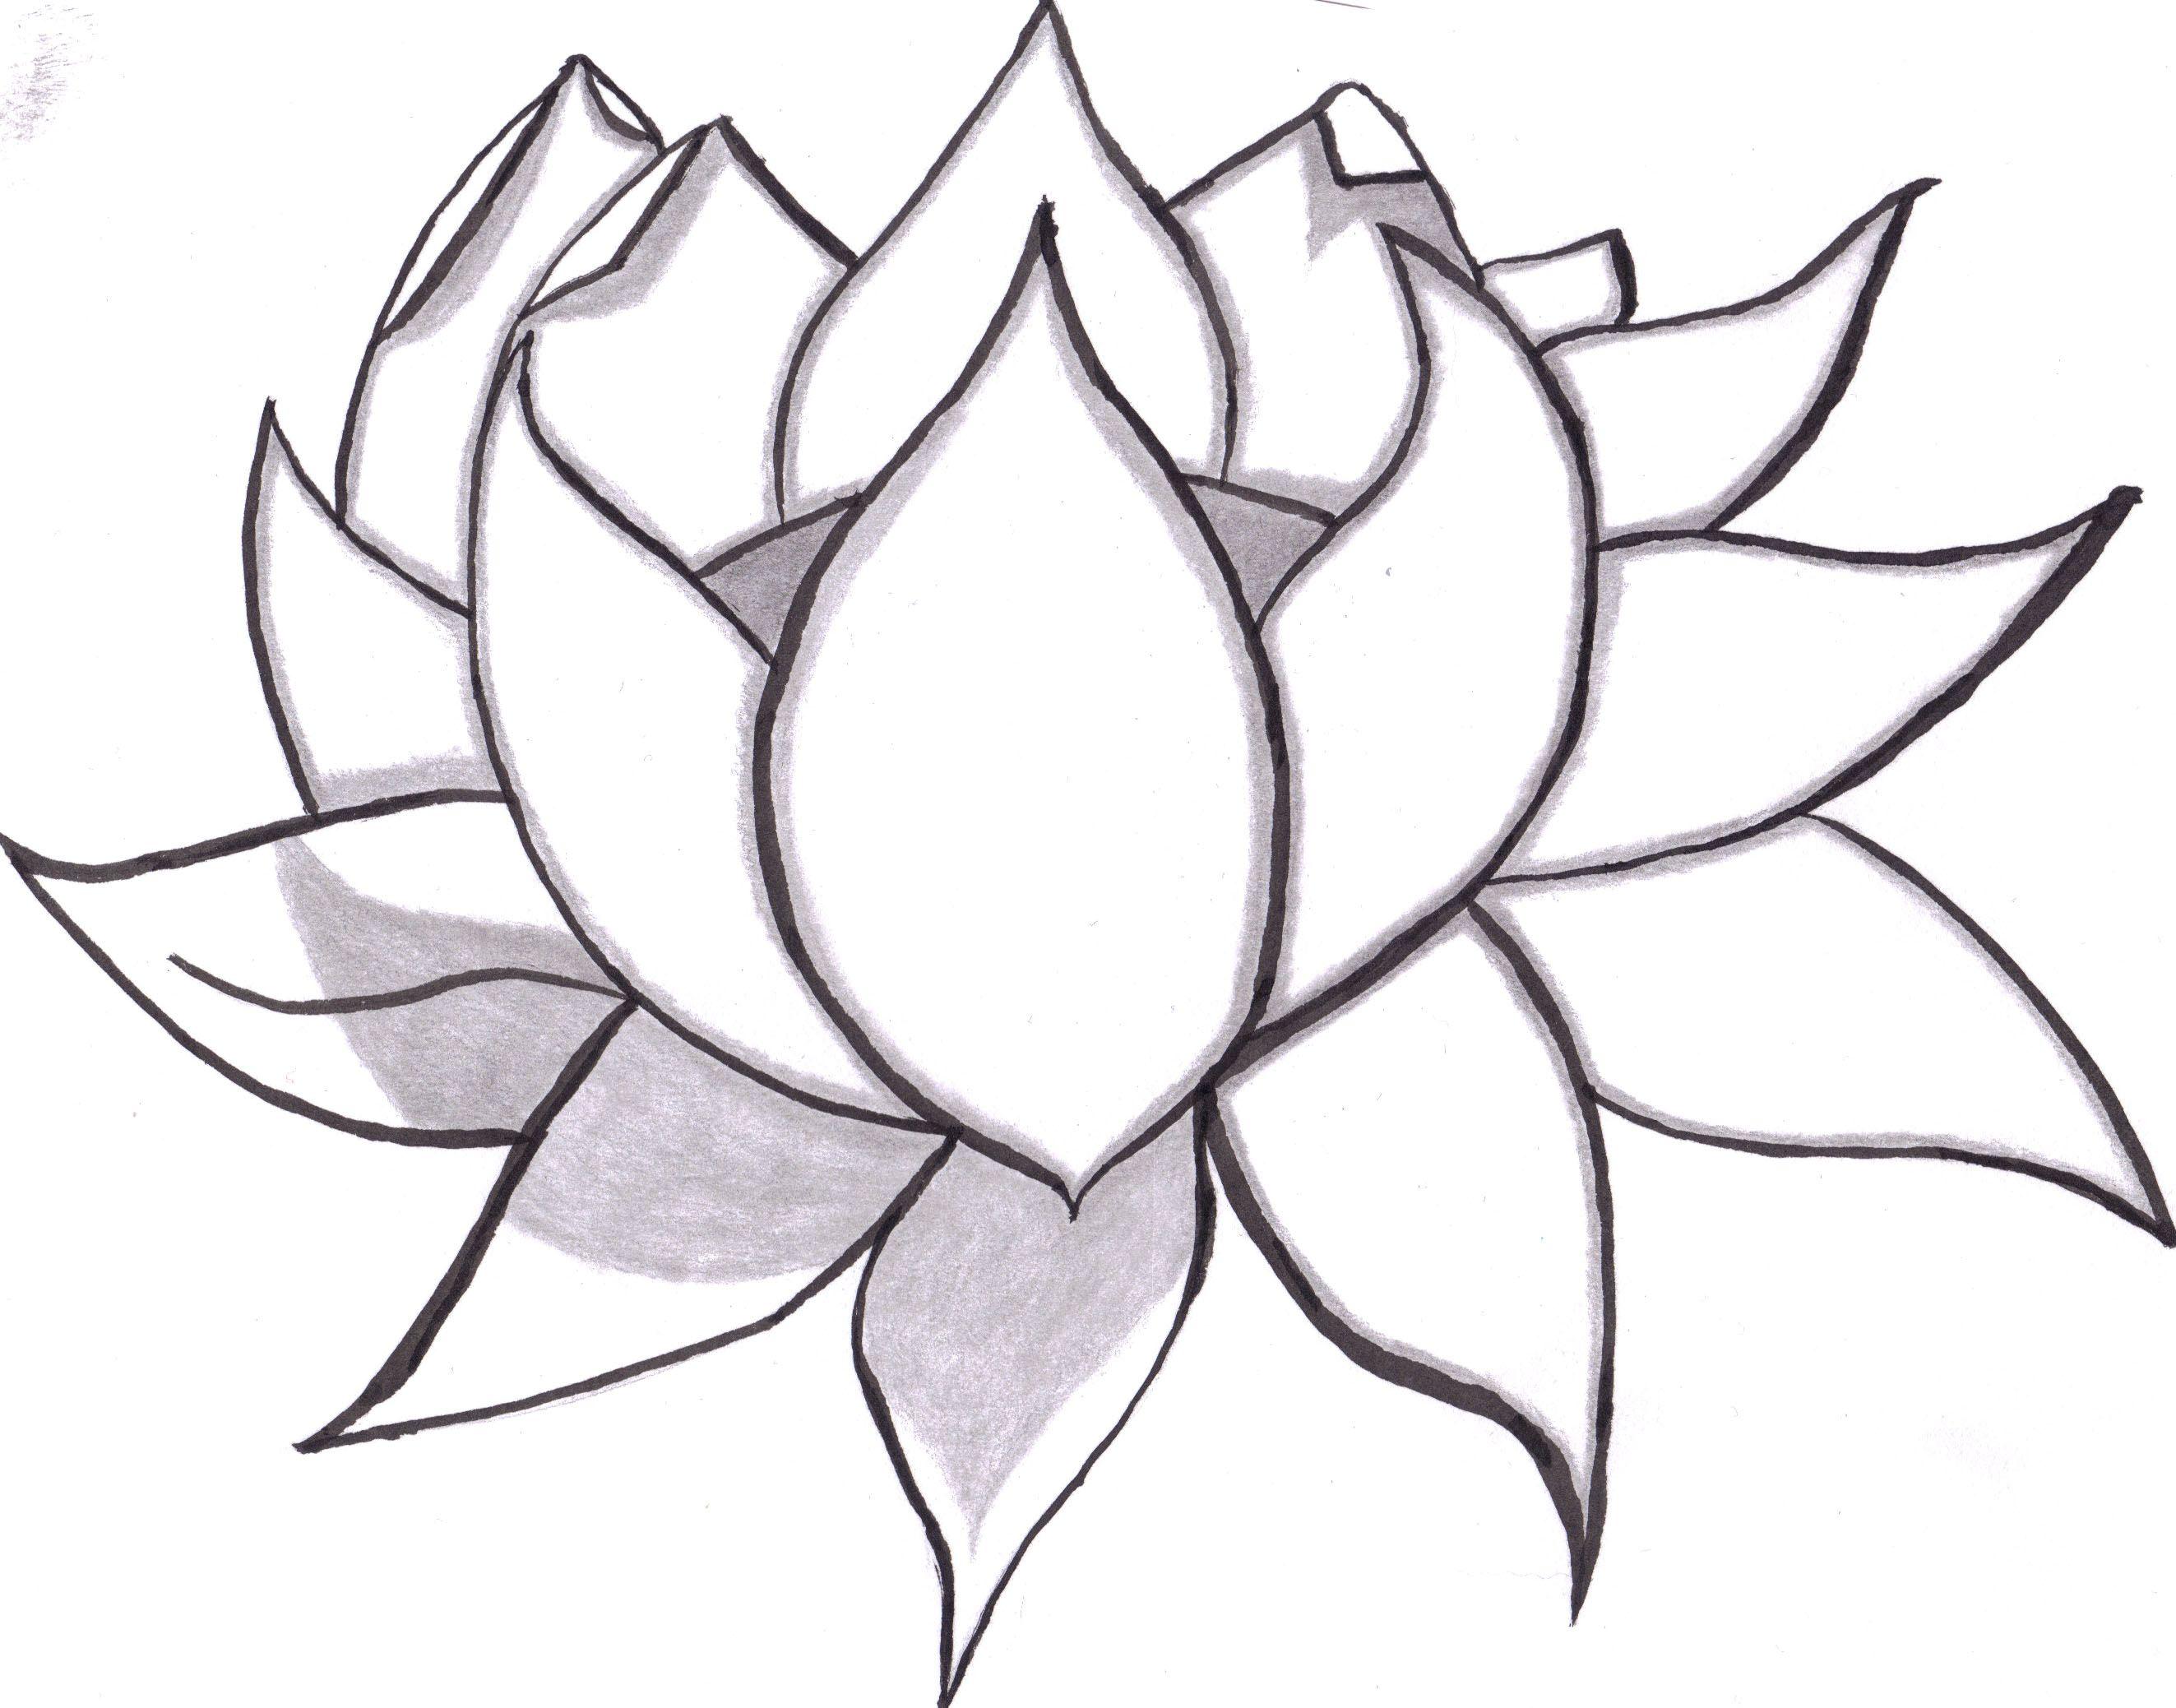 2646x2077 Lotus Flower Outline Drawing Simple Flower Drawing Ideas Lotus